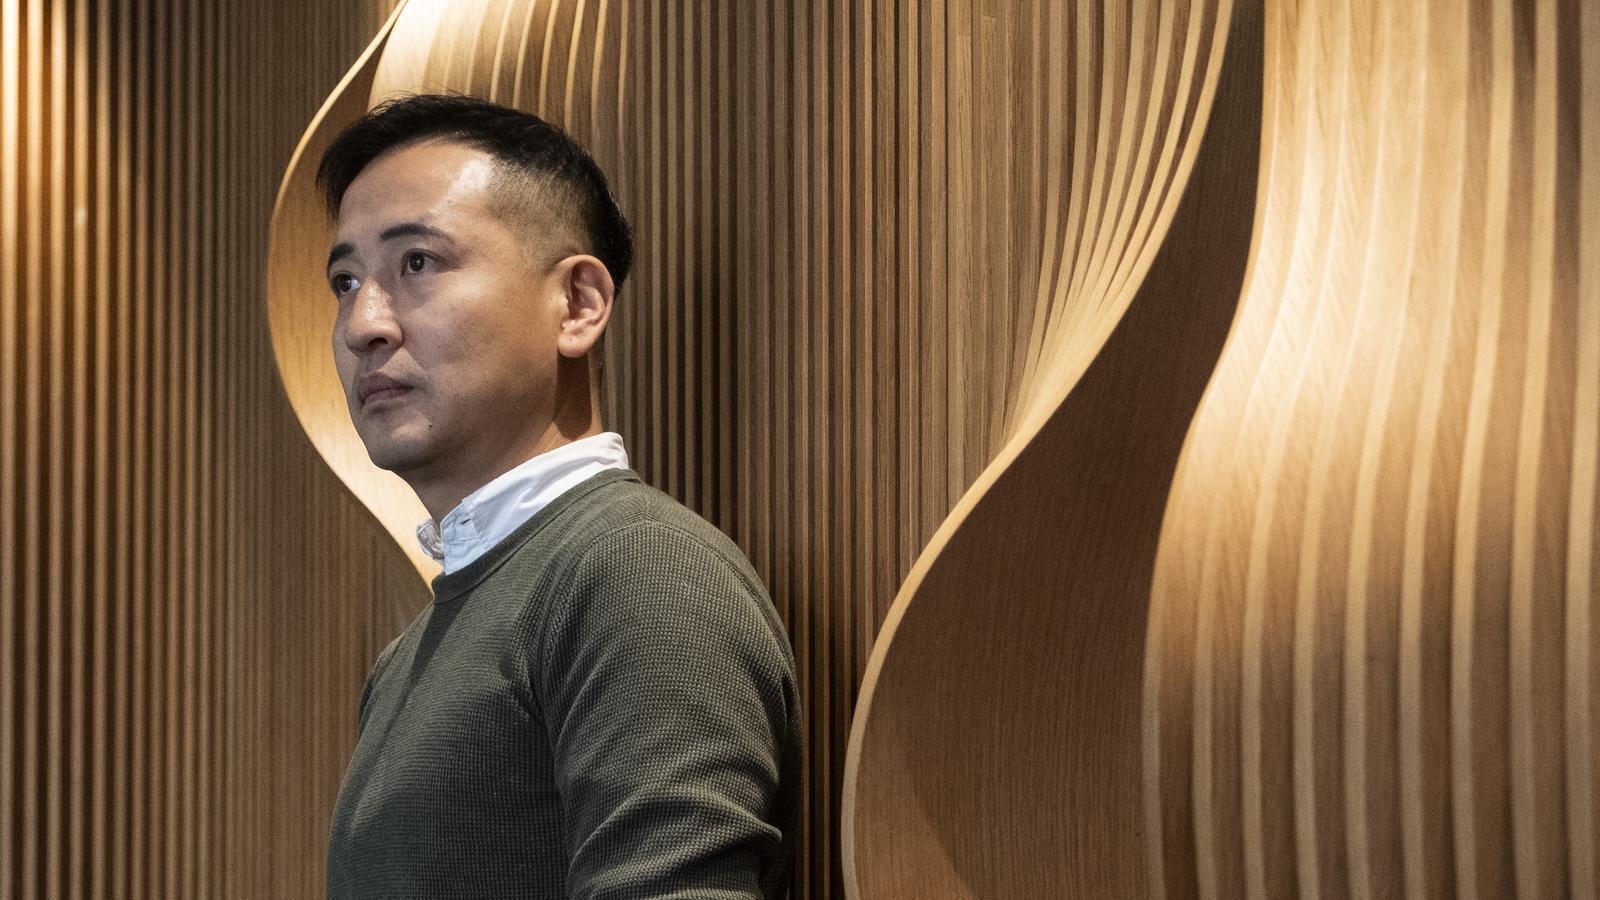 Jason Y. Ng, escriptor i activista pro-democràcia a Hong Kong, va visitar Barcelona.